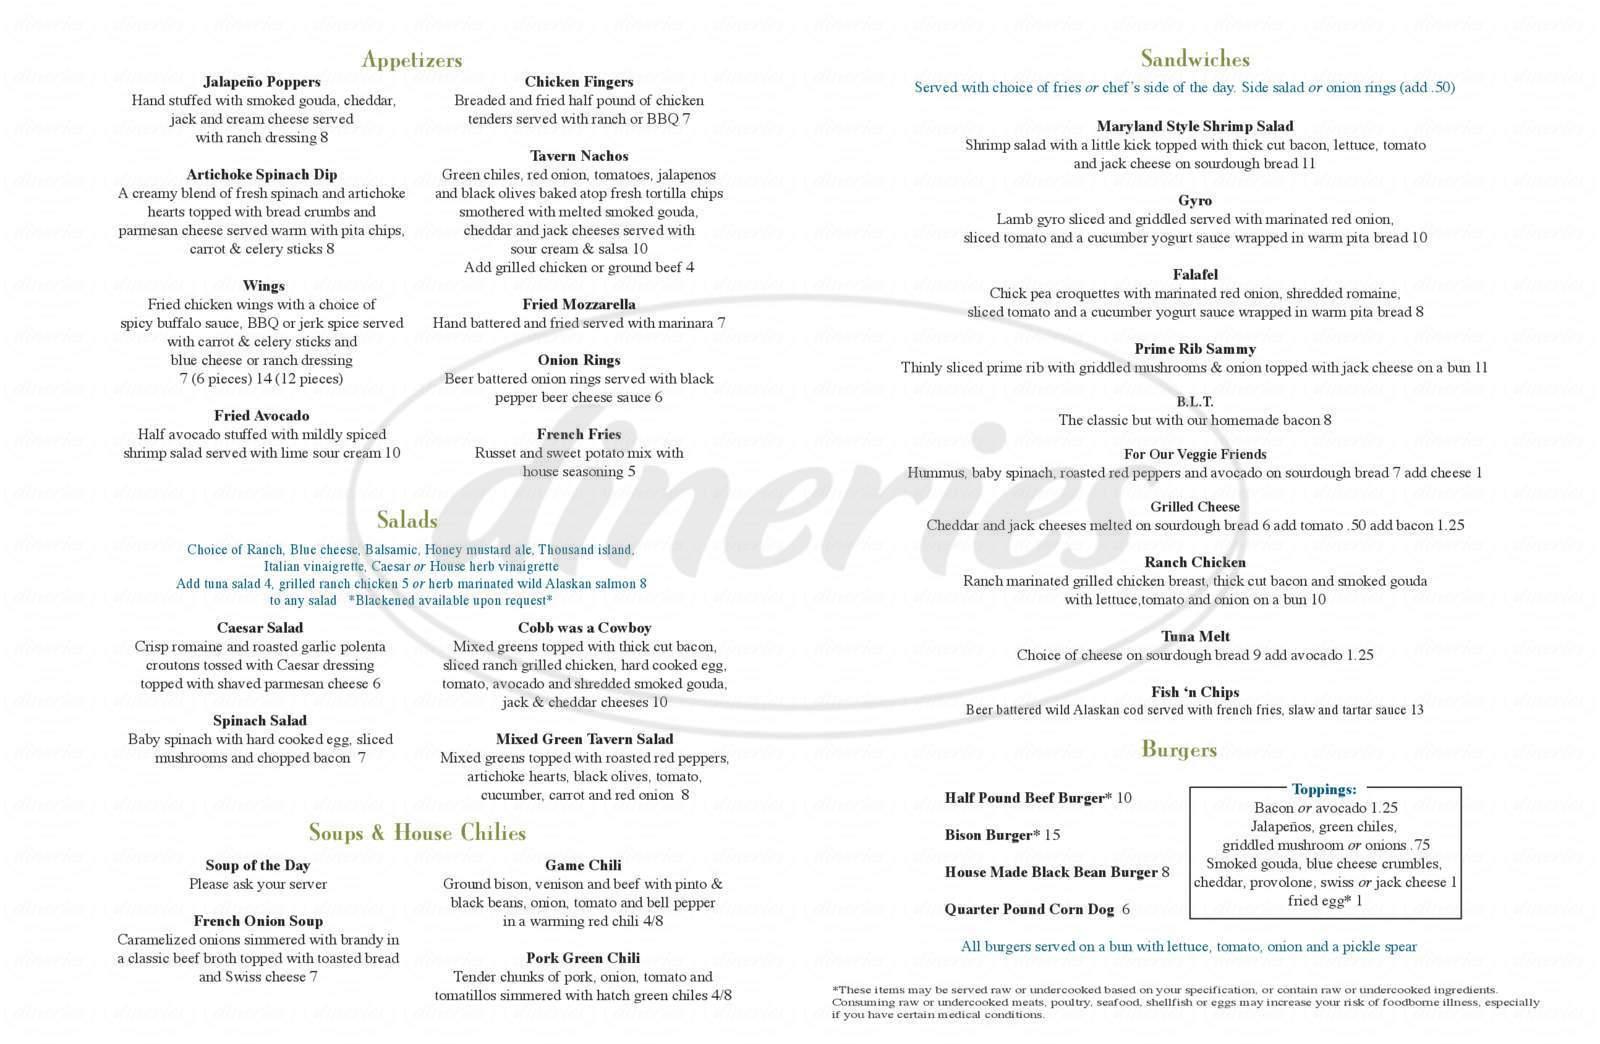 menu for Murphy's Tavern